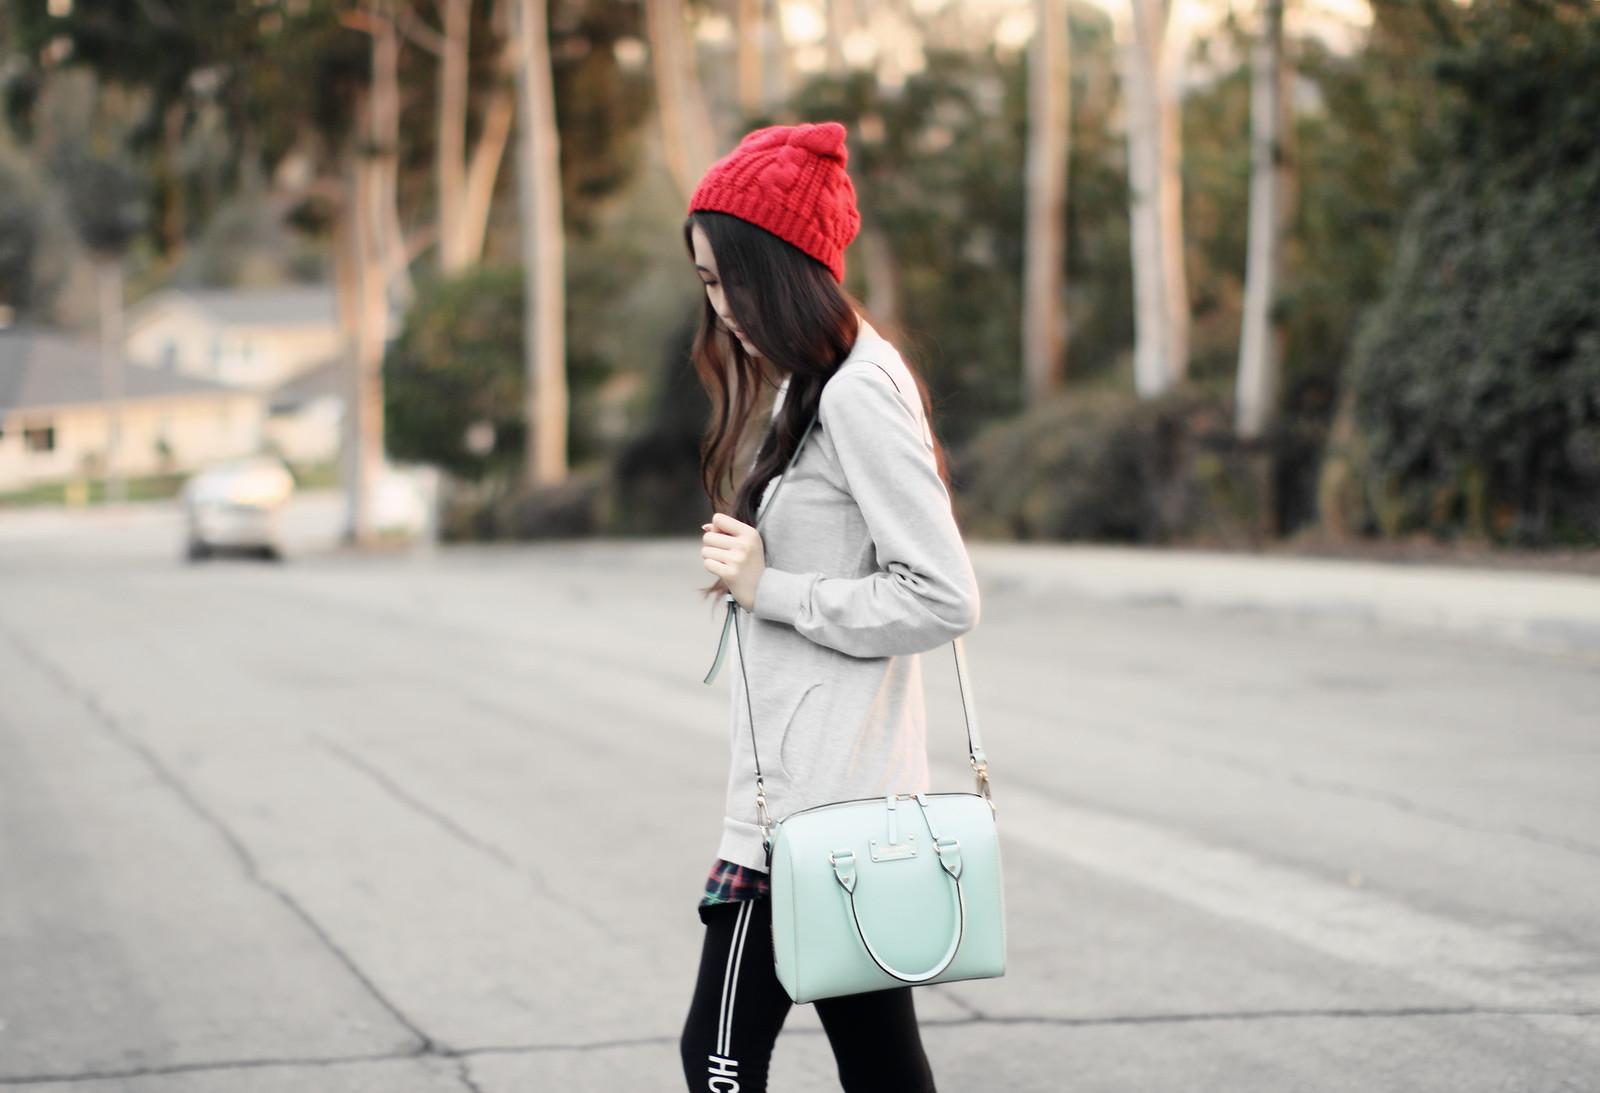 1271-ootd-sweaterdress-koreanfashion-asianfashion-korean-fall-yesstyle-sweaterweather-clothestoyouuu-blogger-elizabeeetht